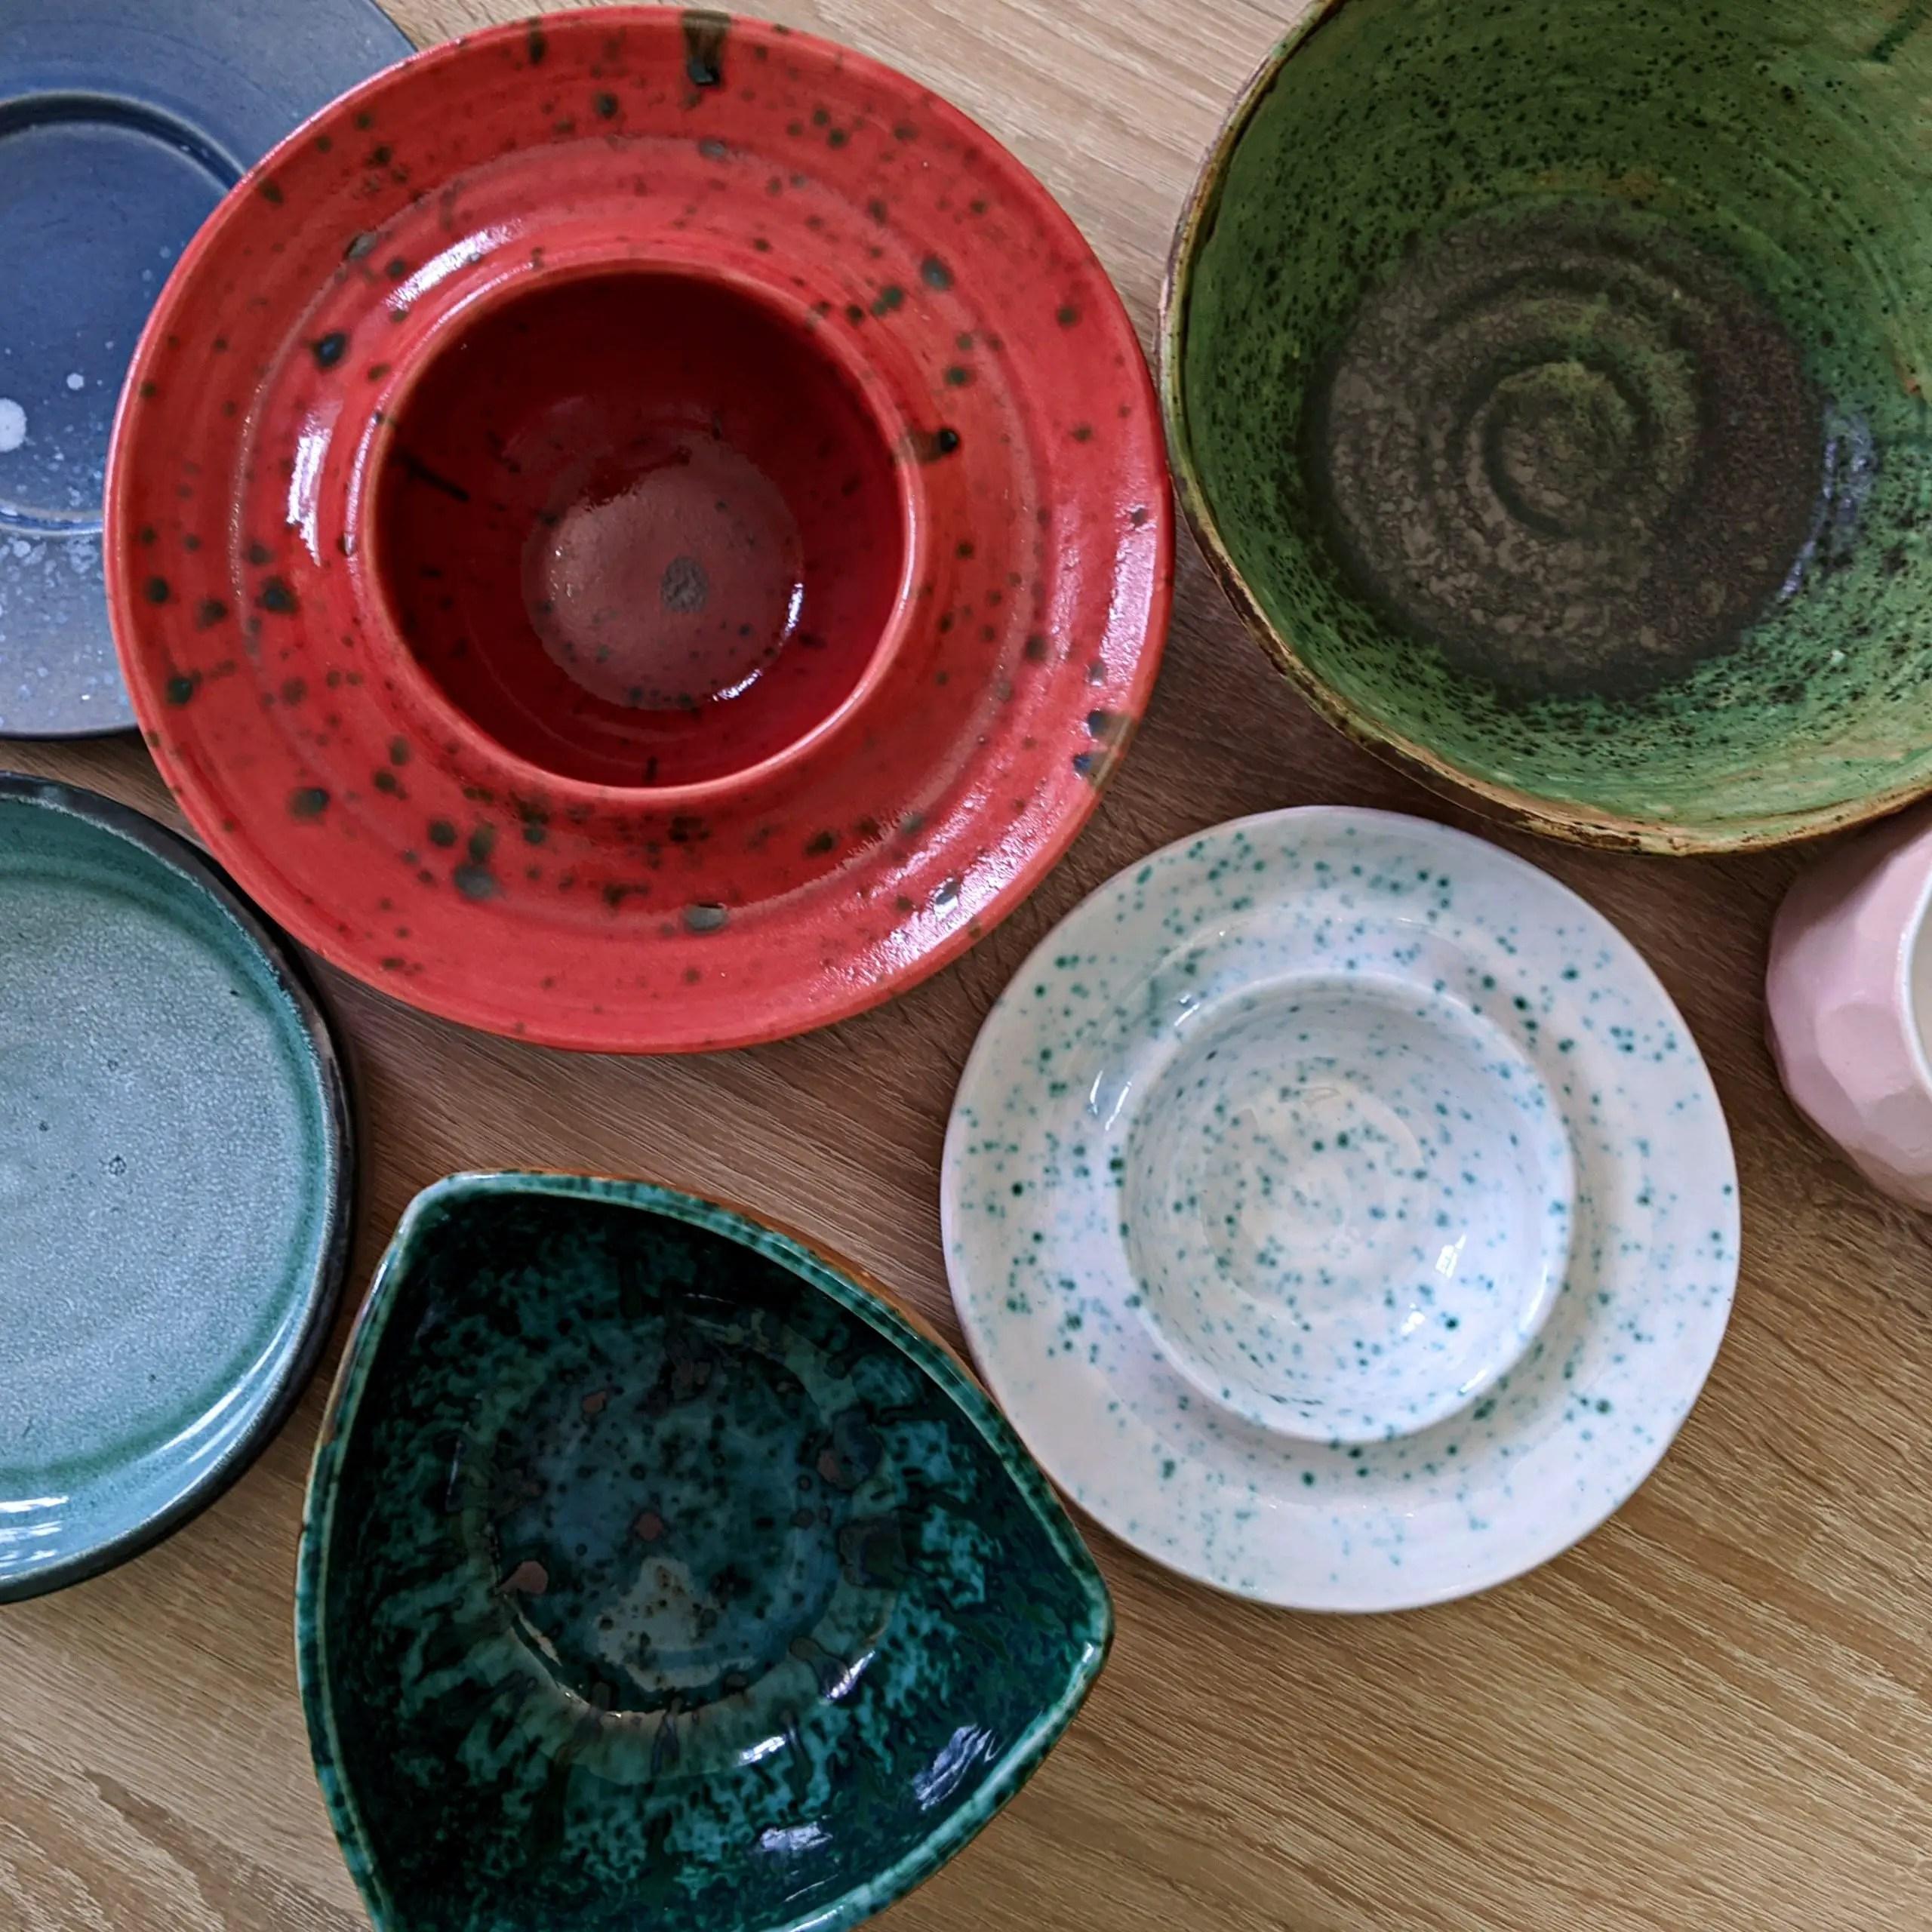 Finished ceramics